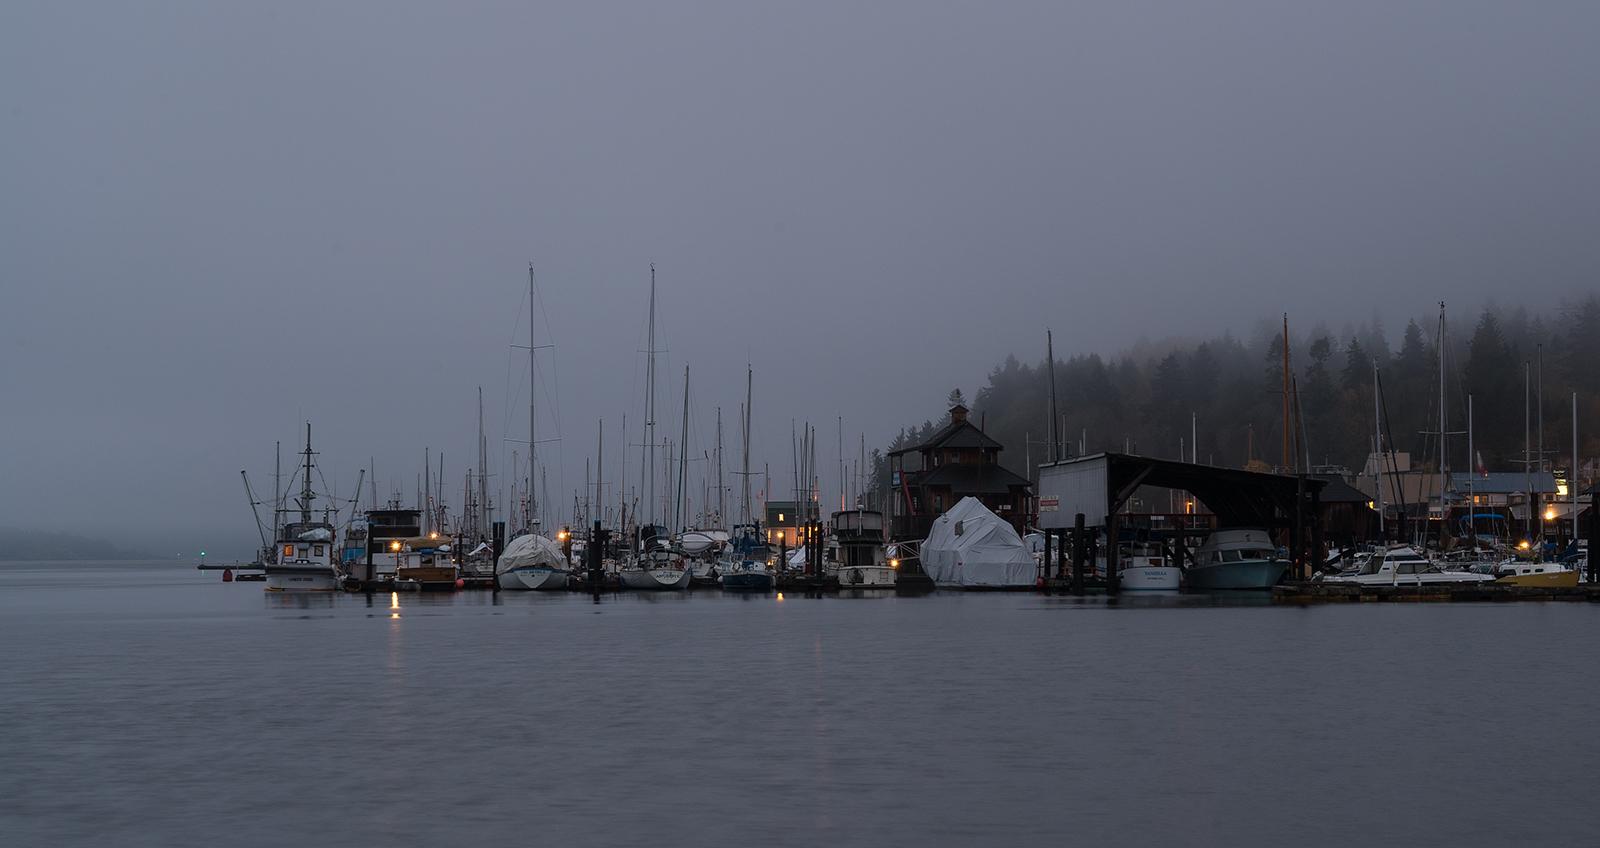 Gloomy Sunday Morning In Cowichan Bay